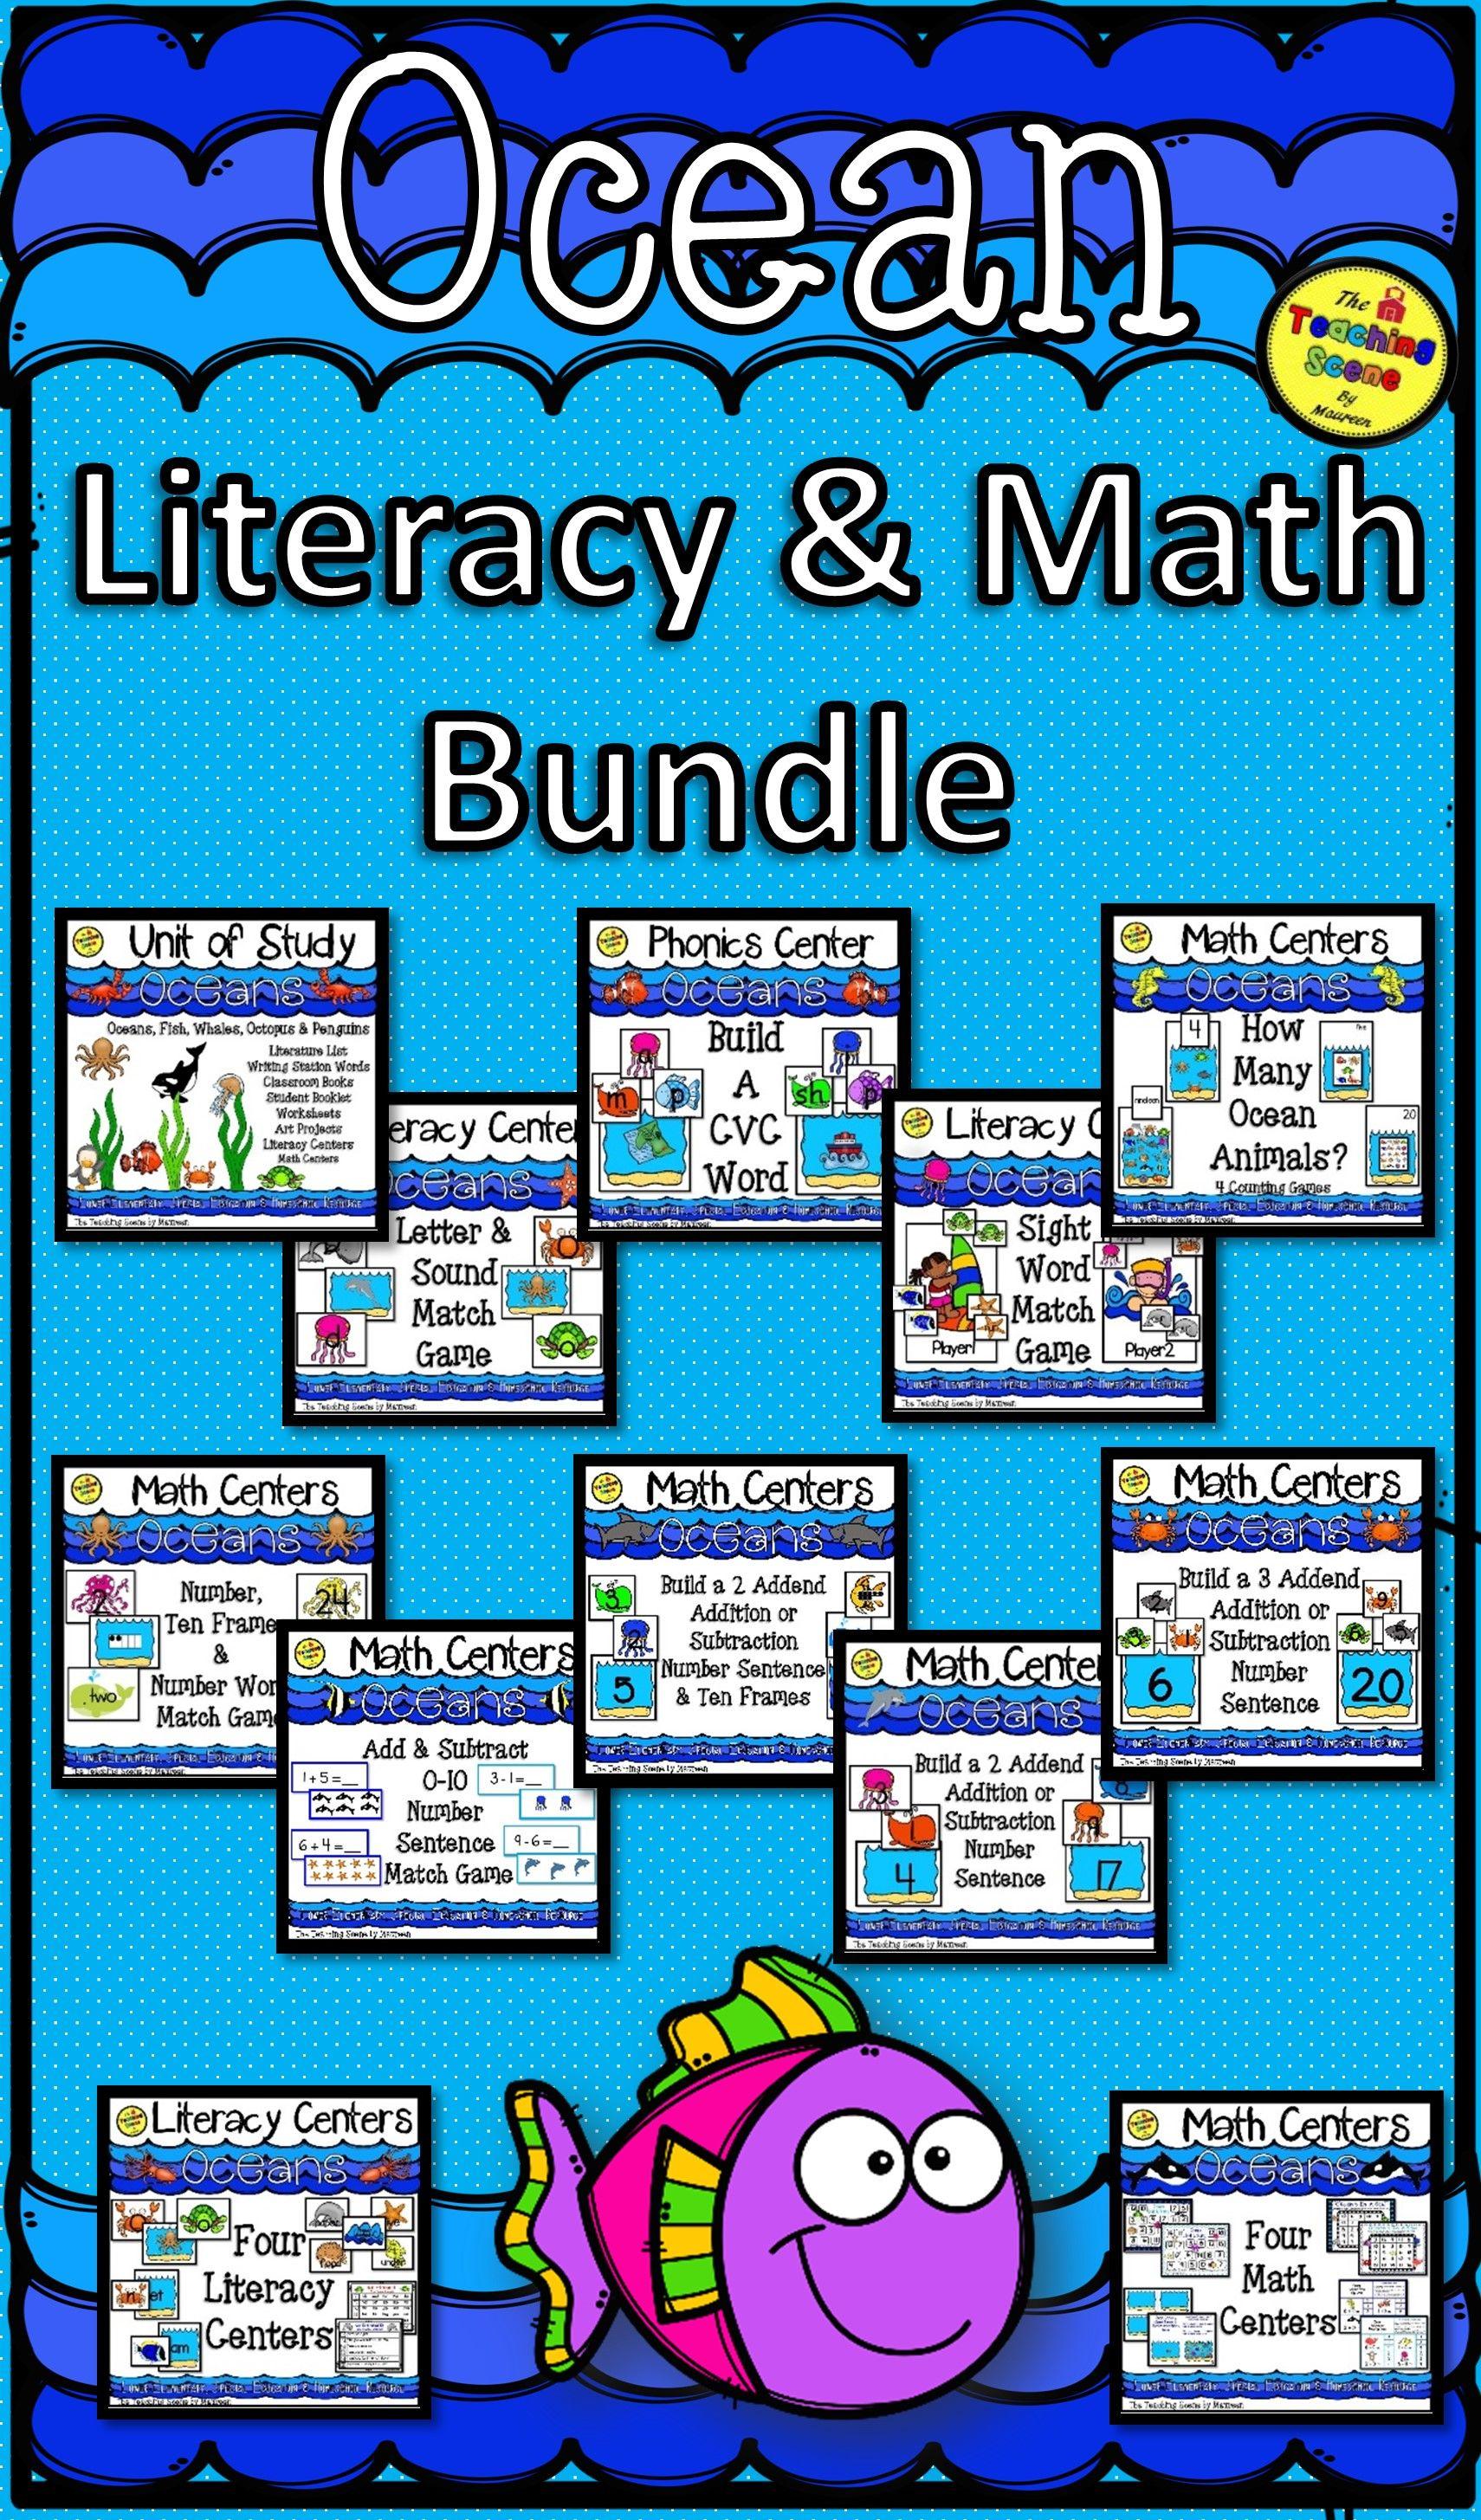 Ocean Themed Literacy Amp Math Bundle